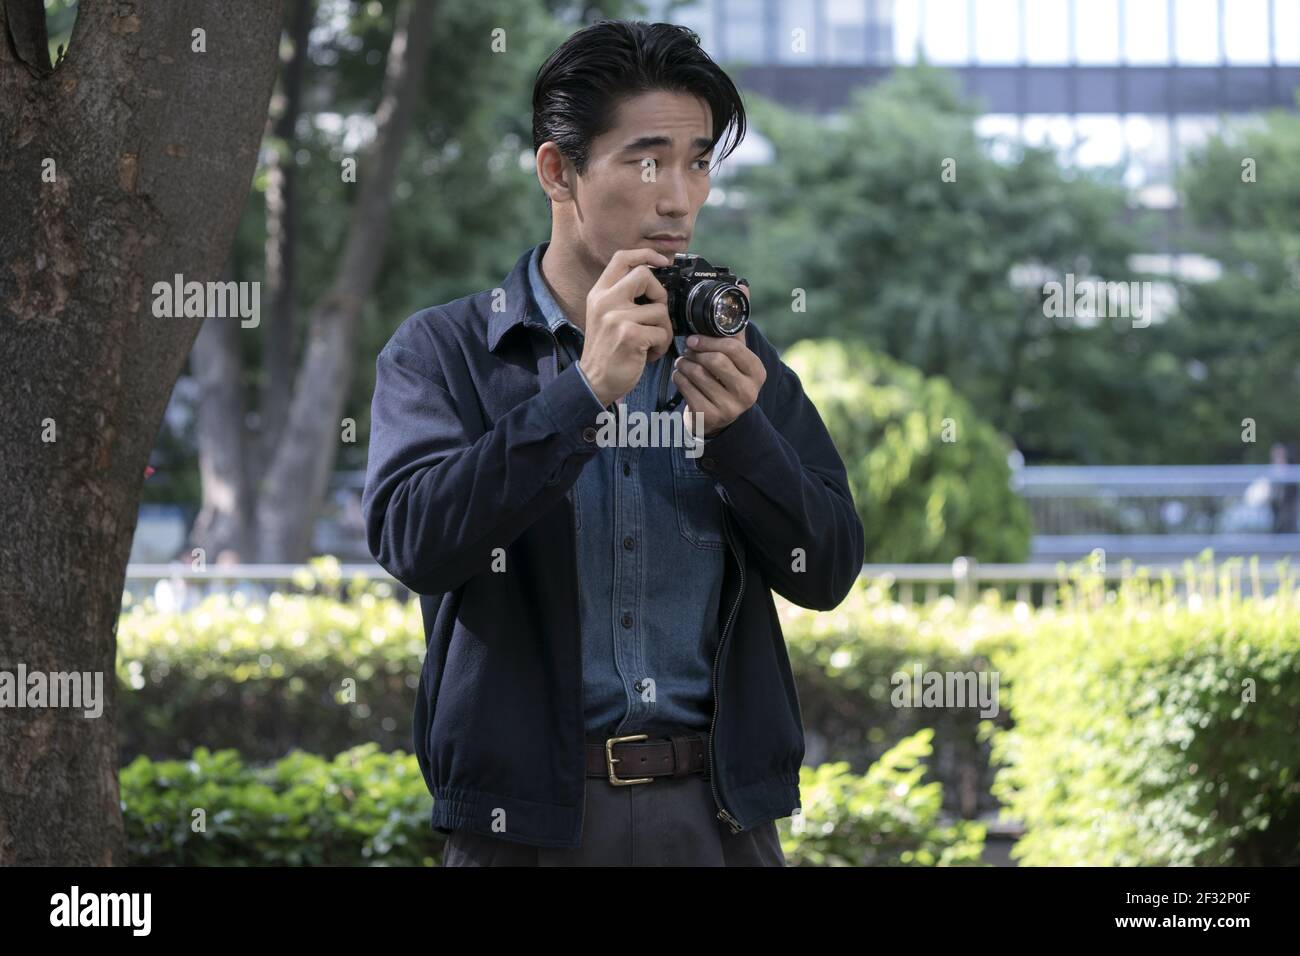 NAOKI KOBAYASHI, ERDBEBENVOGEL, 2019, ©MURRAY CLOSE/NETFLIX Stockfoto